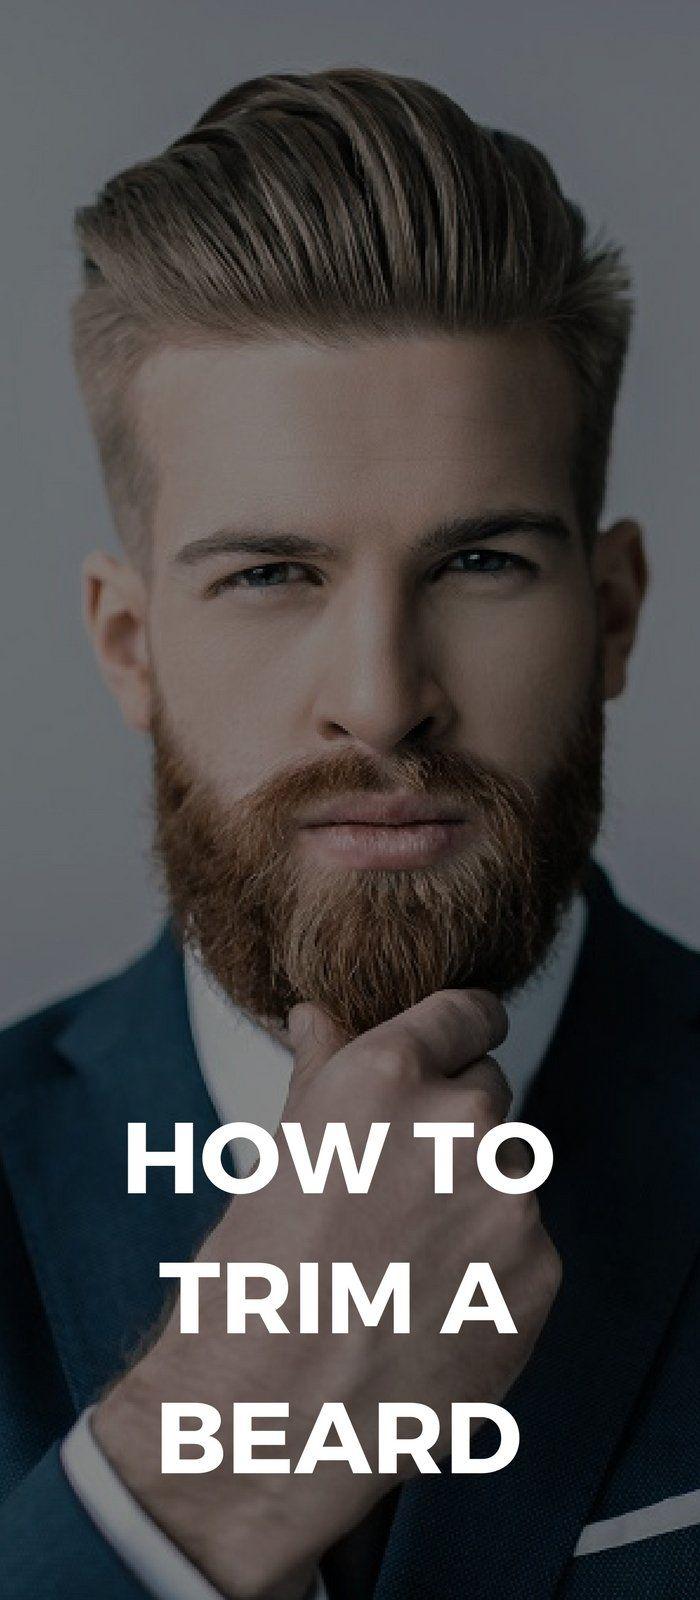 How To Trim A Beard | Beard shapes, Beard grooming styles ...